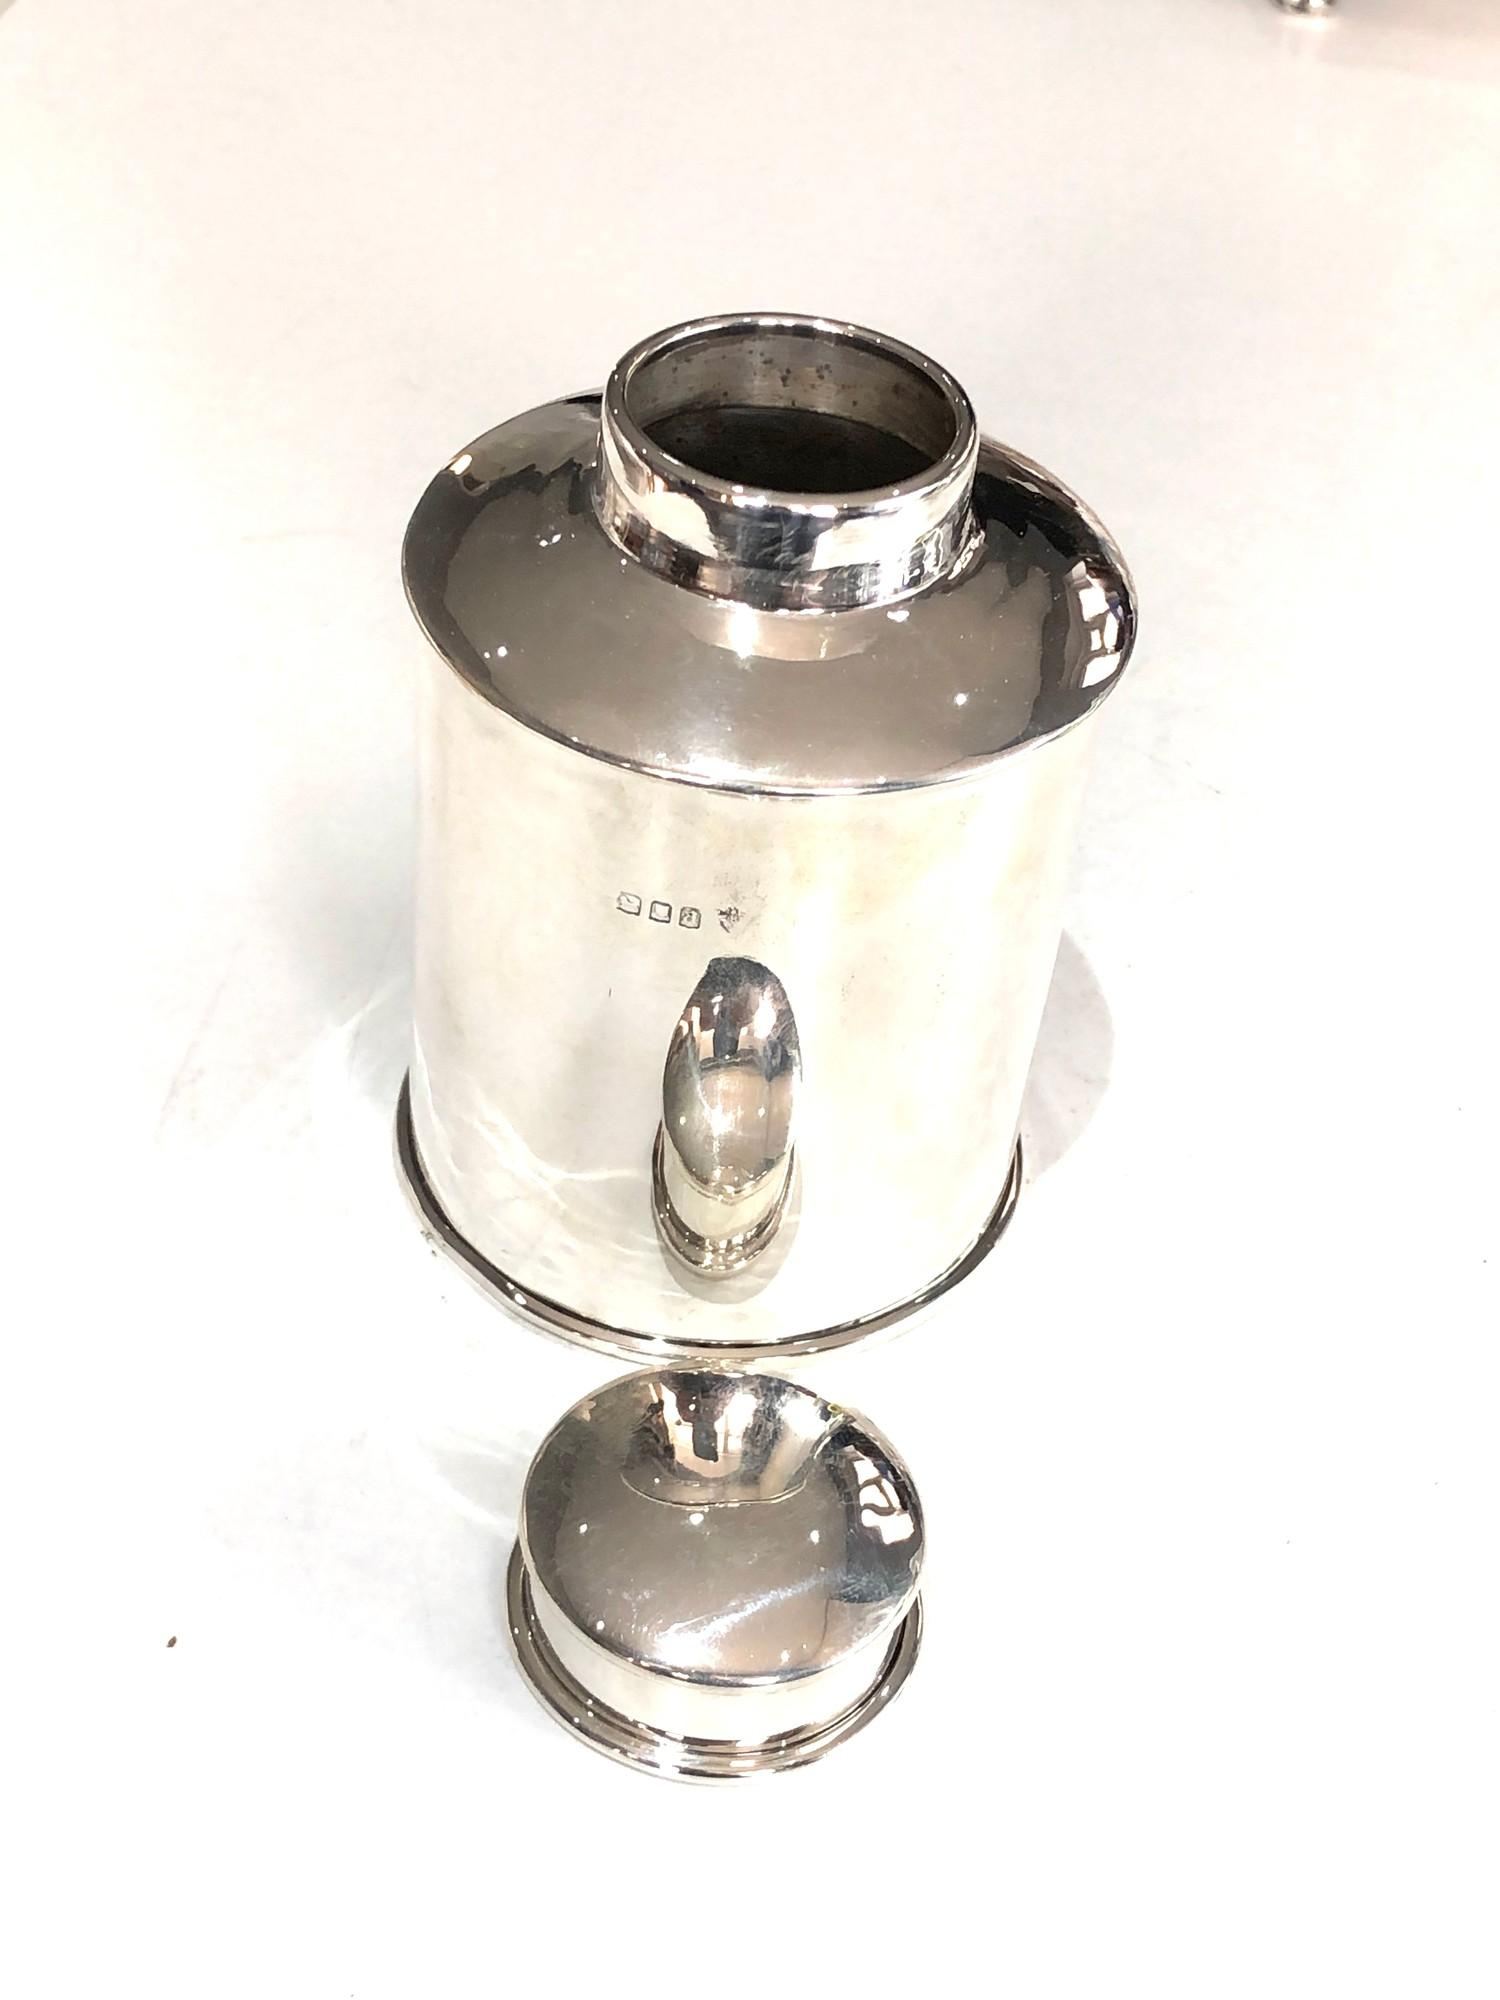 A George V silver cylindrical tea caddy 11cm high London 1916 - Image 3 of 6